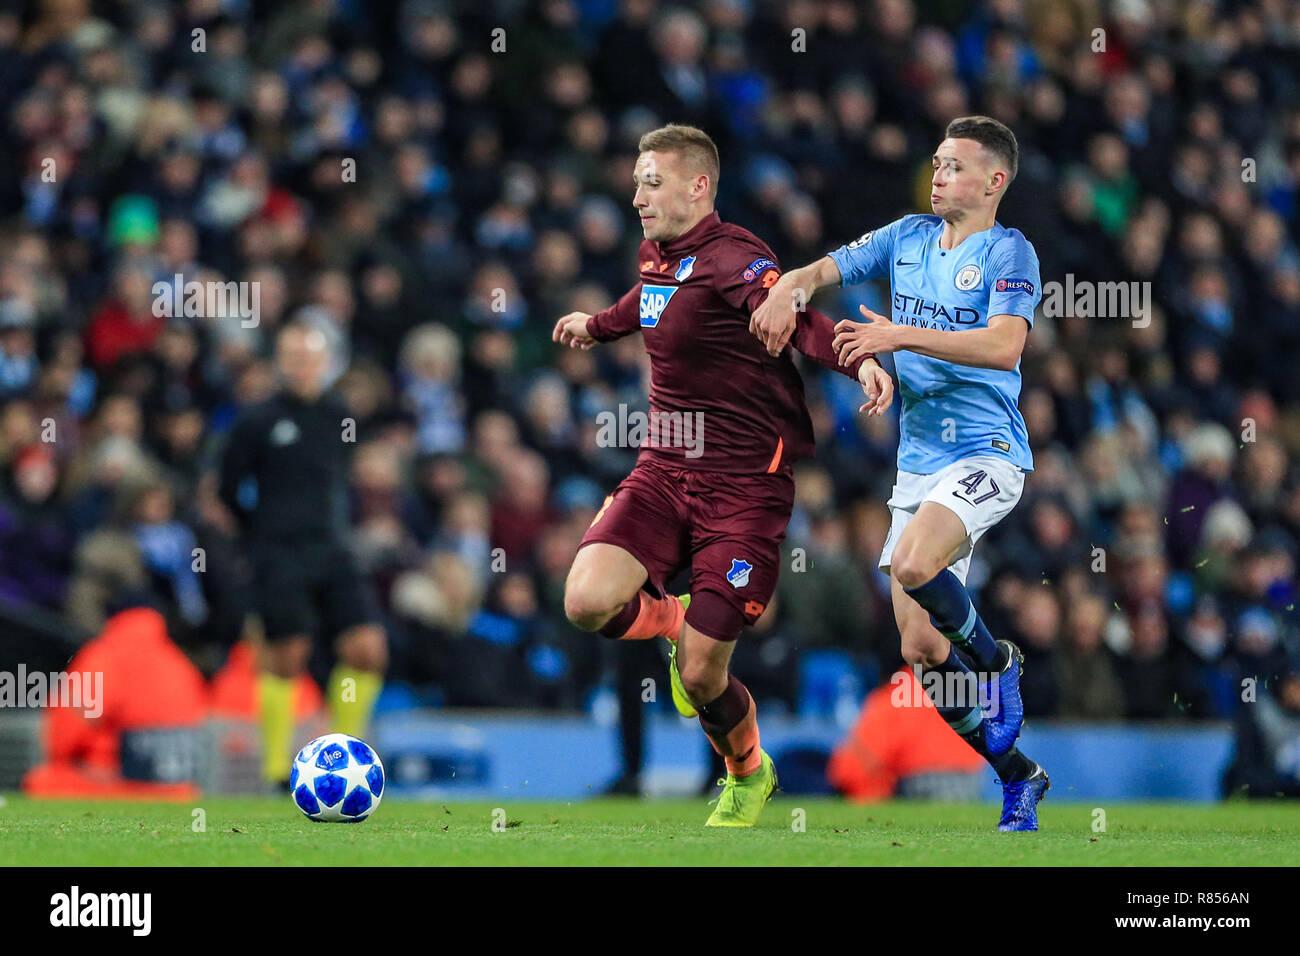 12th December 2018, Etihad Stadium, Manchester, England; UEFA Champions League, Manchester City v TSG 1899 Hoffenheim ;   Credit: Mark Cosgrove/News Images - Stock Image